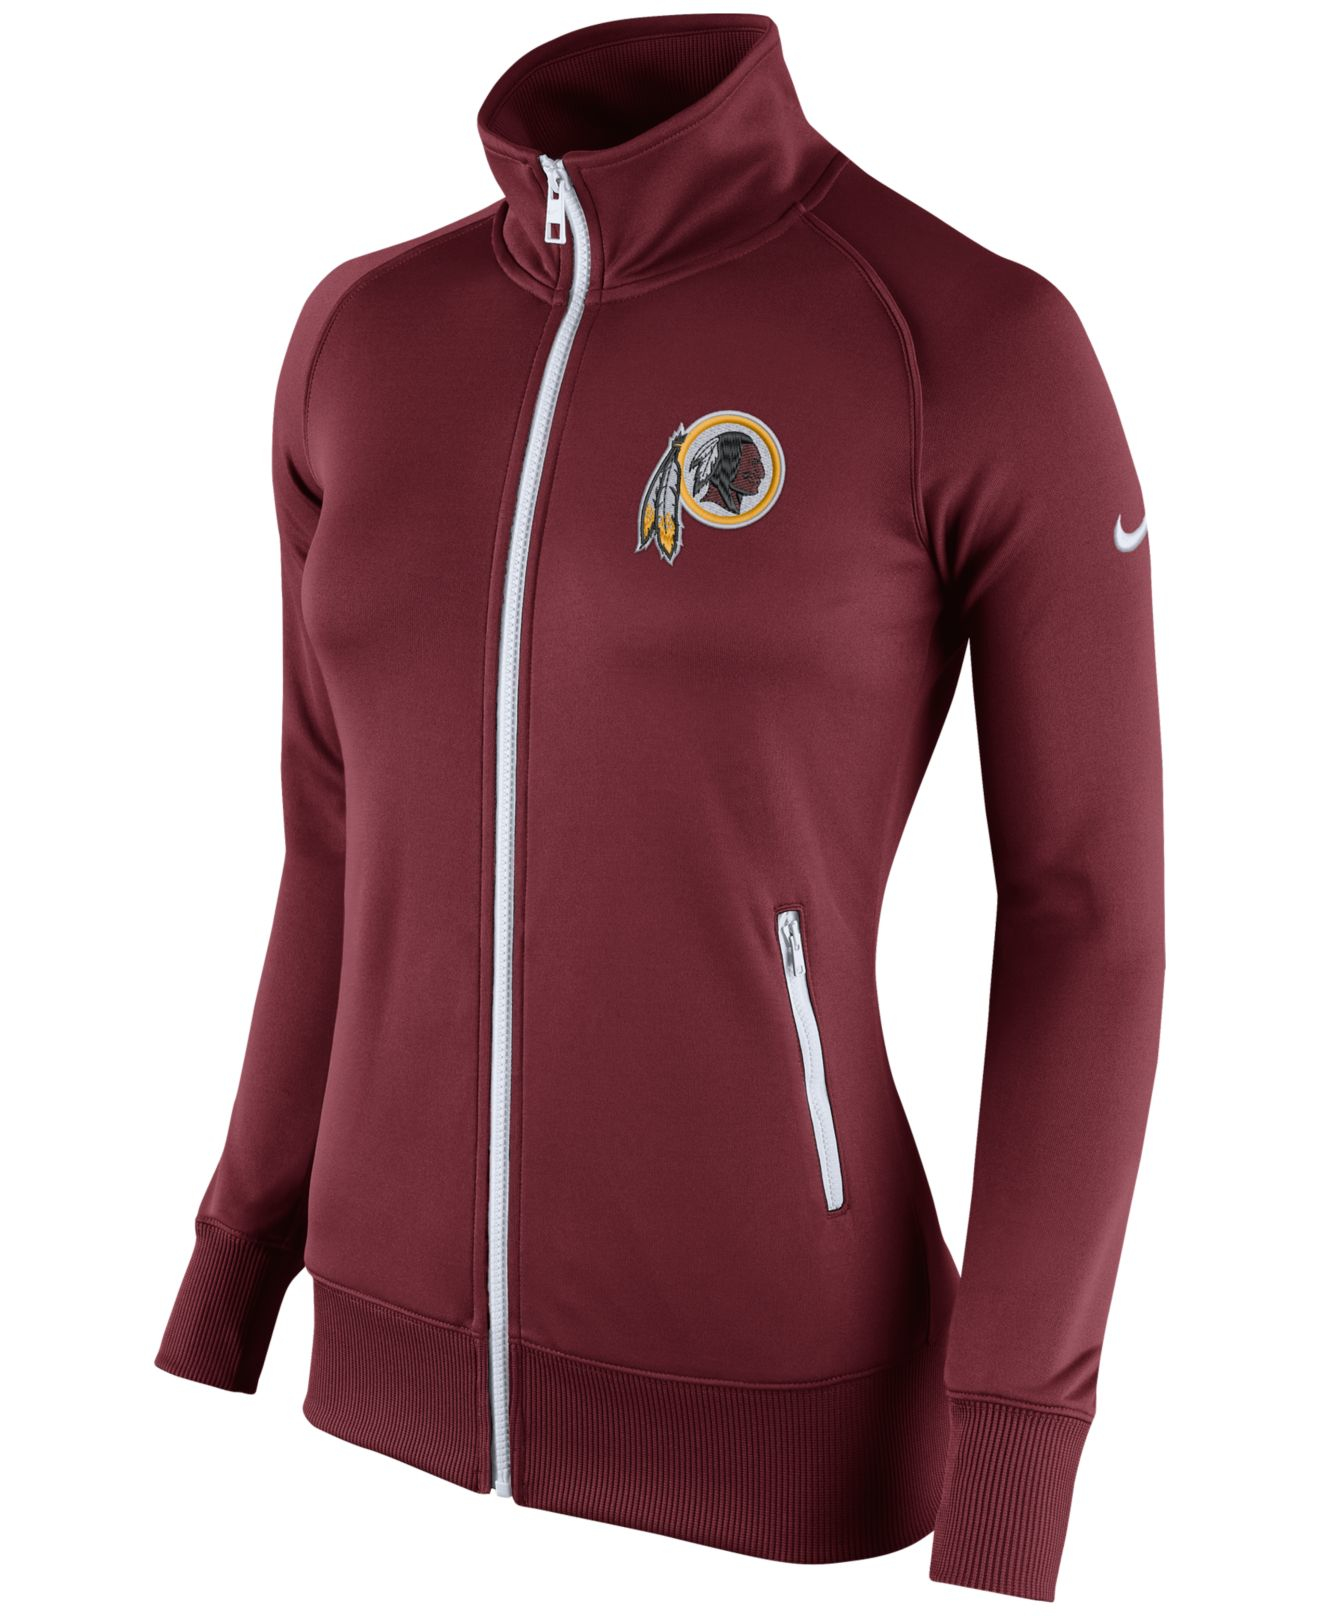 f34b6bad6 Lyst - Nike Women s Washington Redskins Stadium Track Jacket in Red